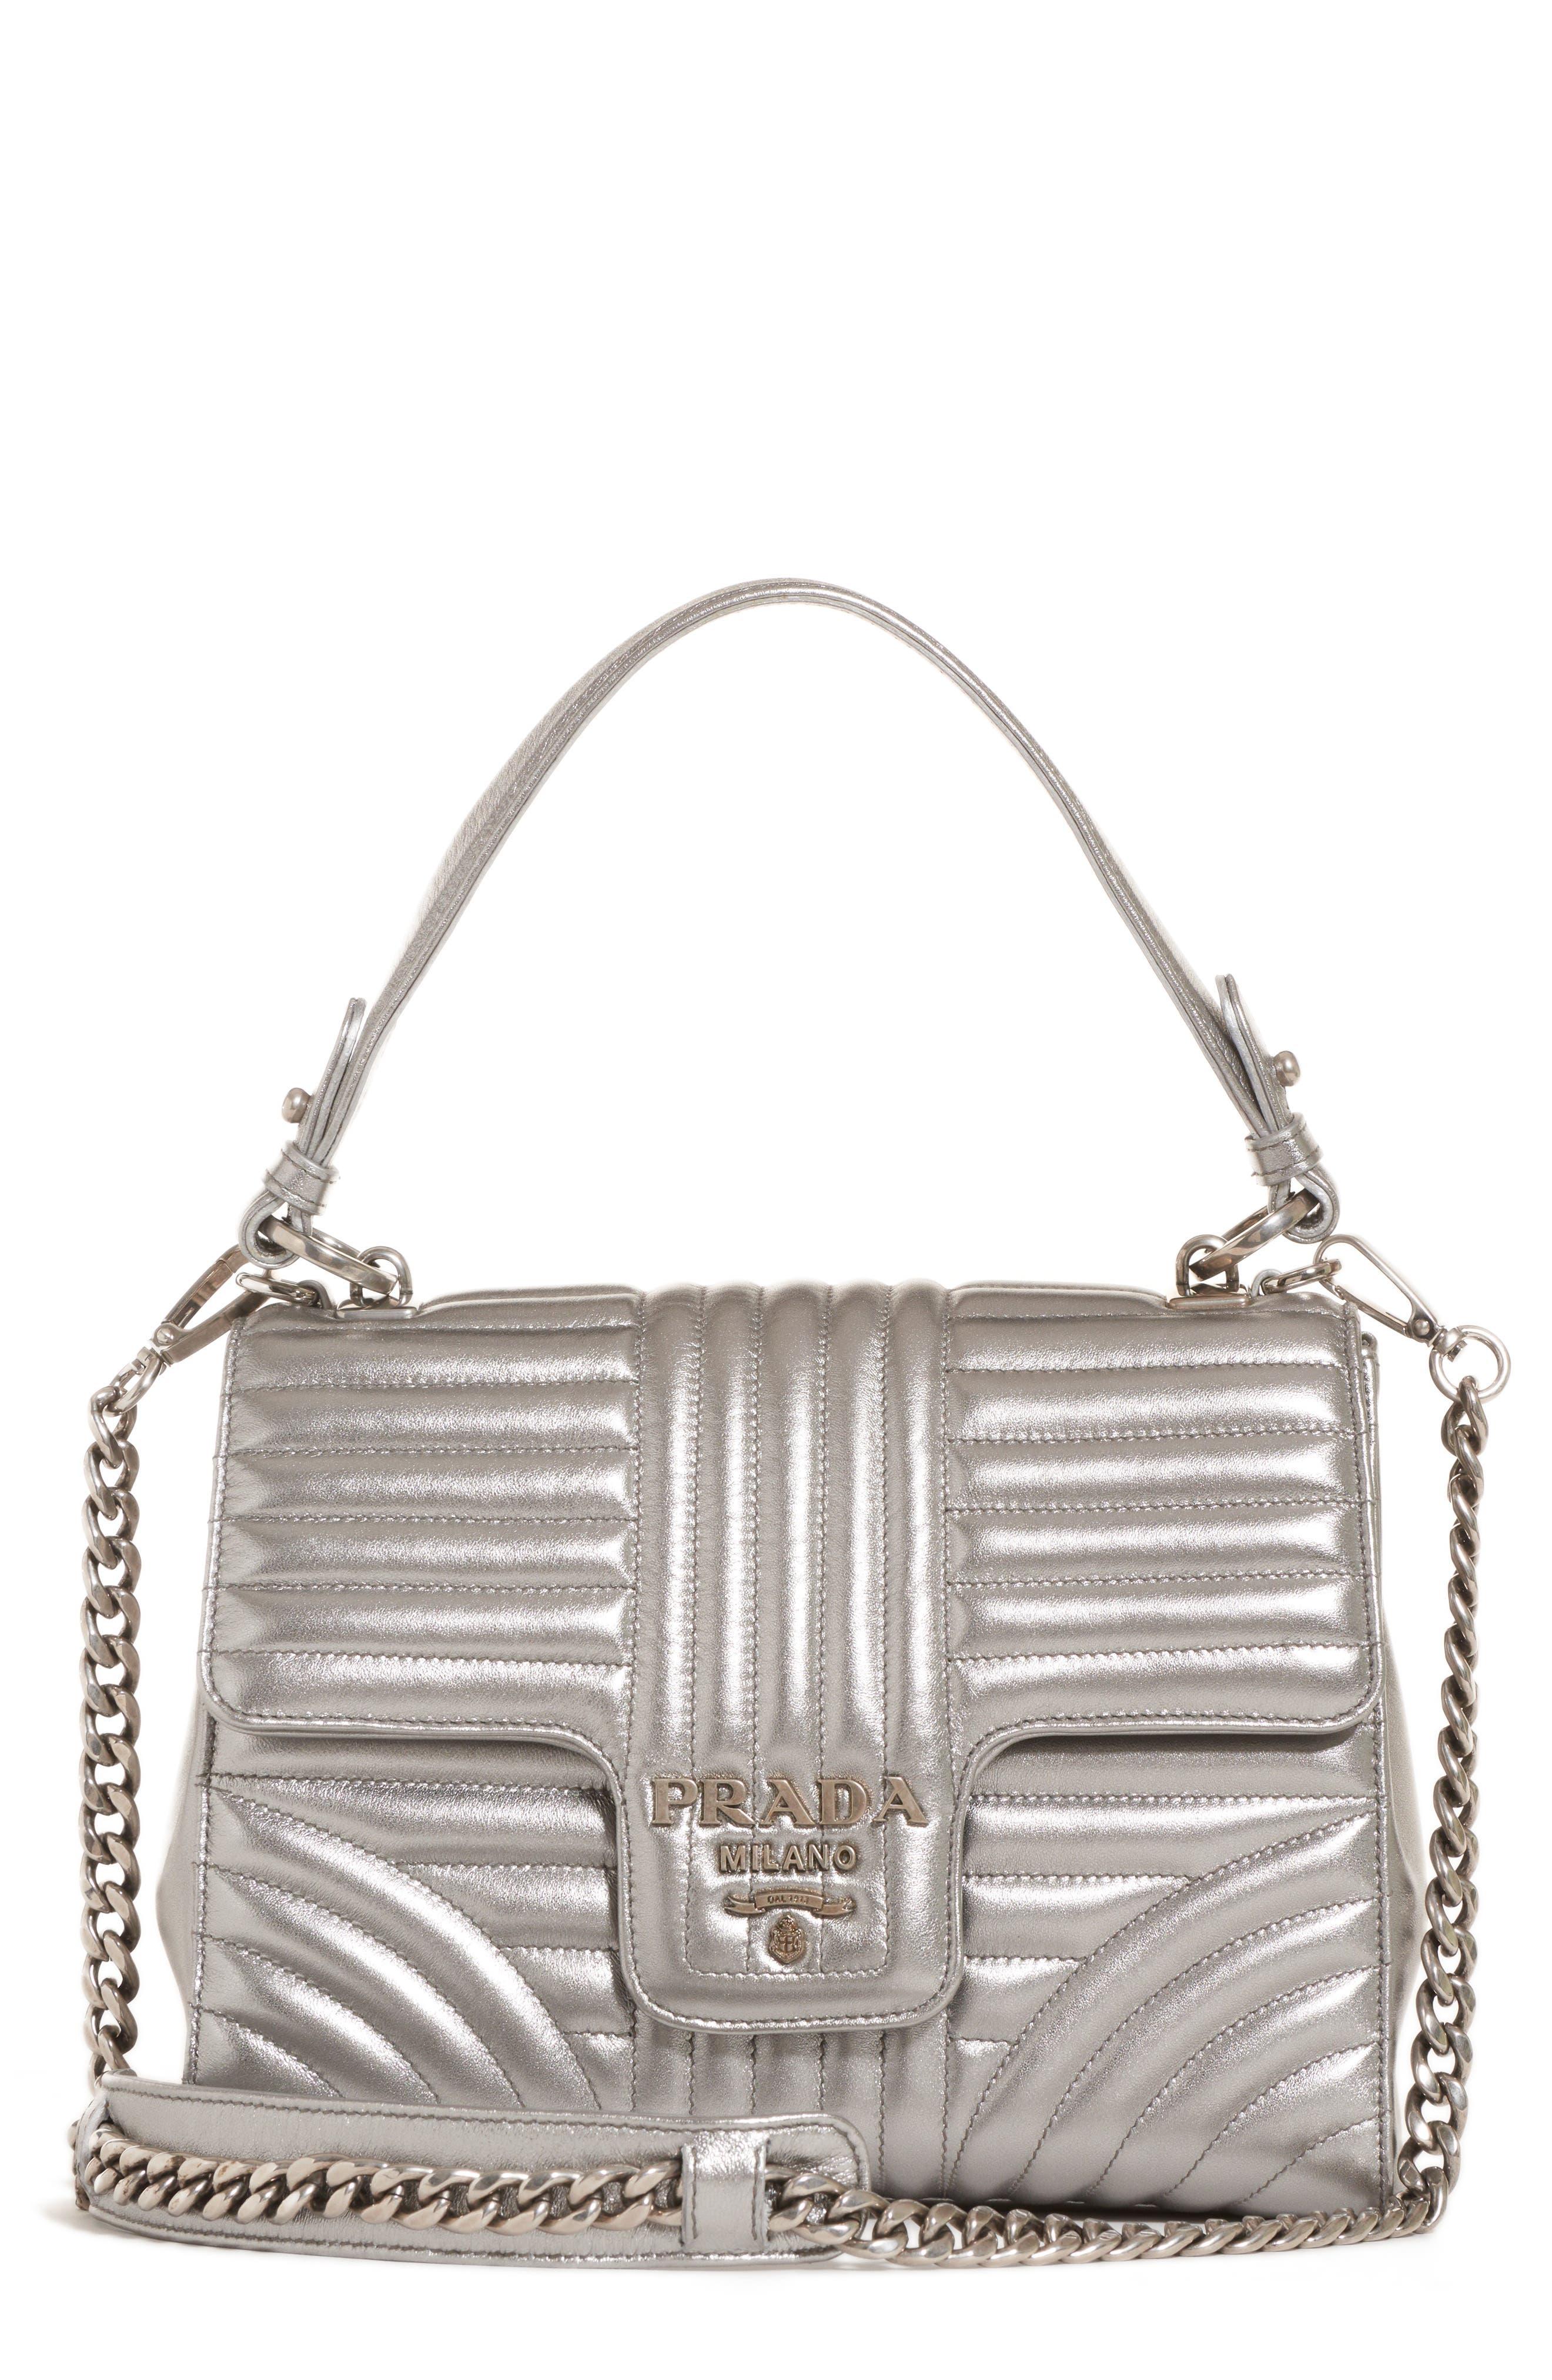 Quilted Metallic Lambskin Leather Handbag,                             Main thumbnail 1, color,                             CROMO